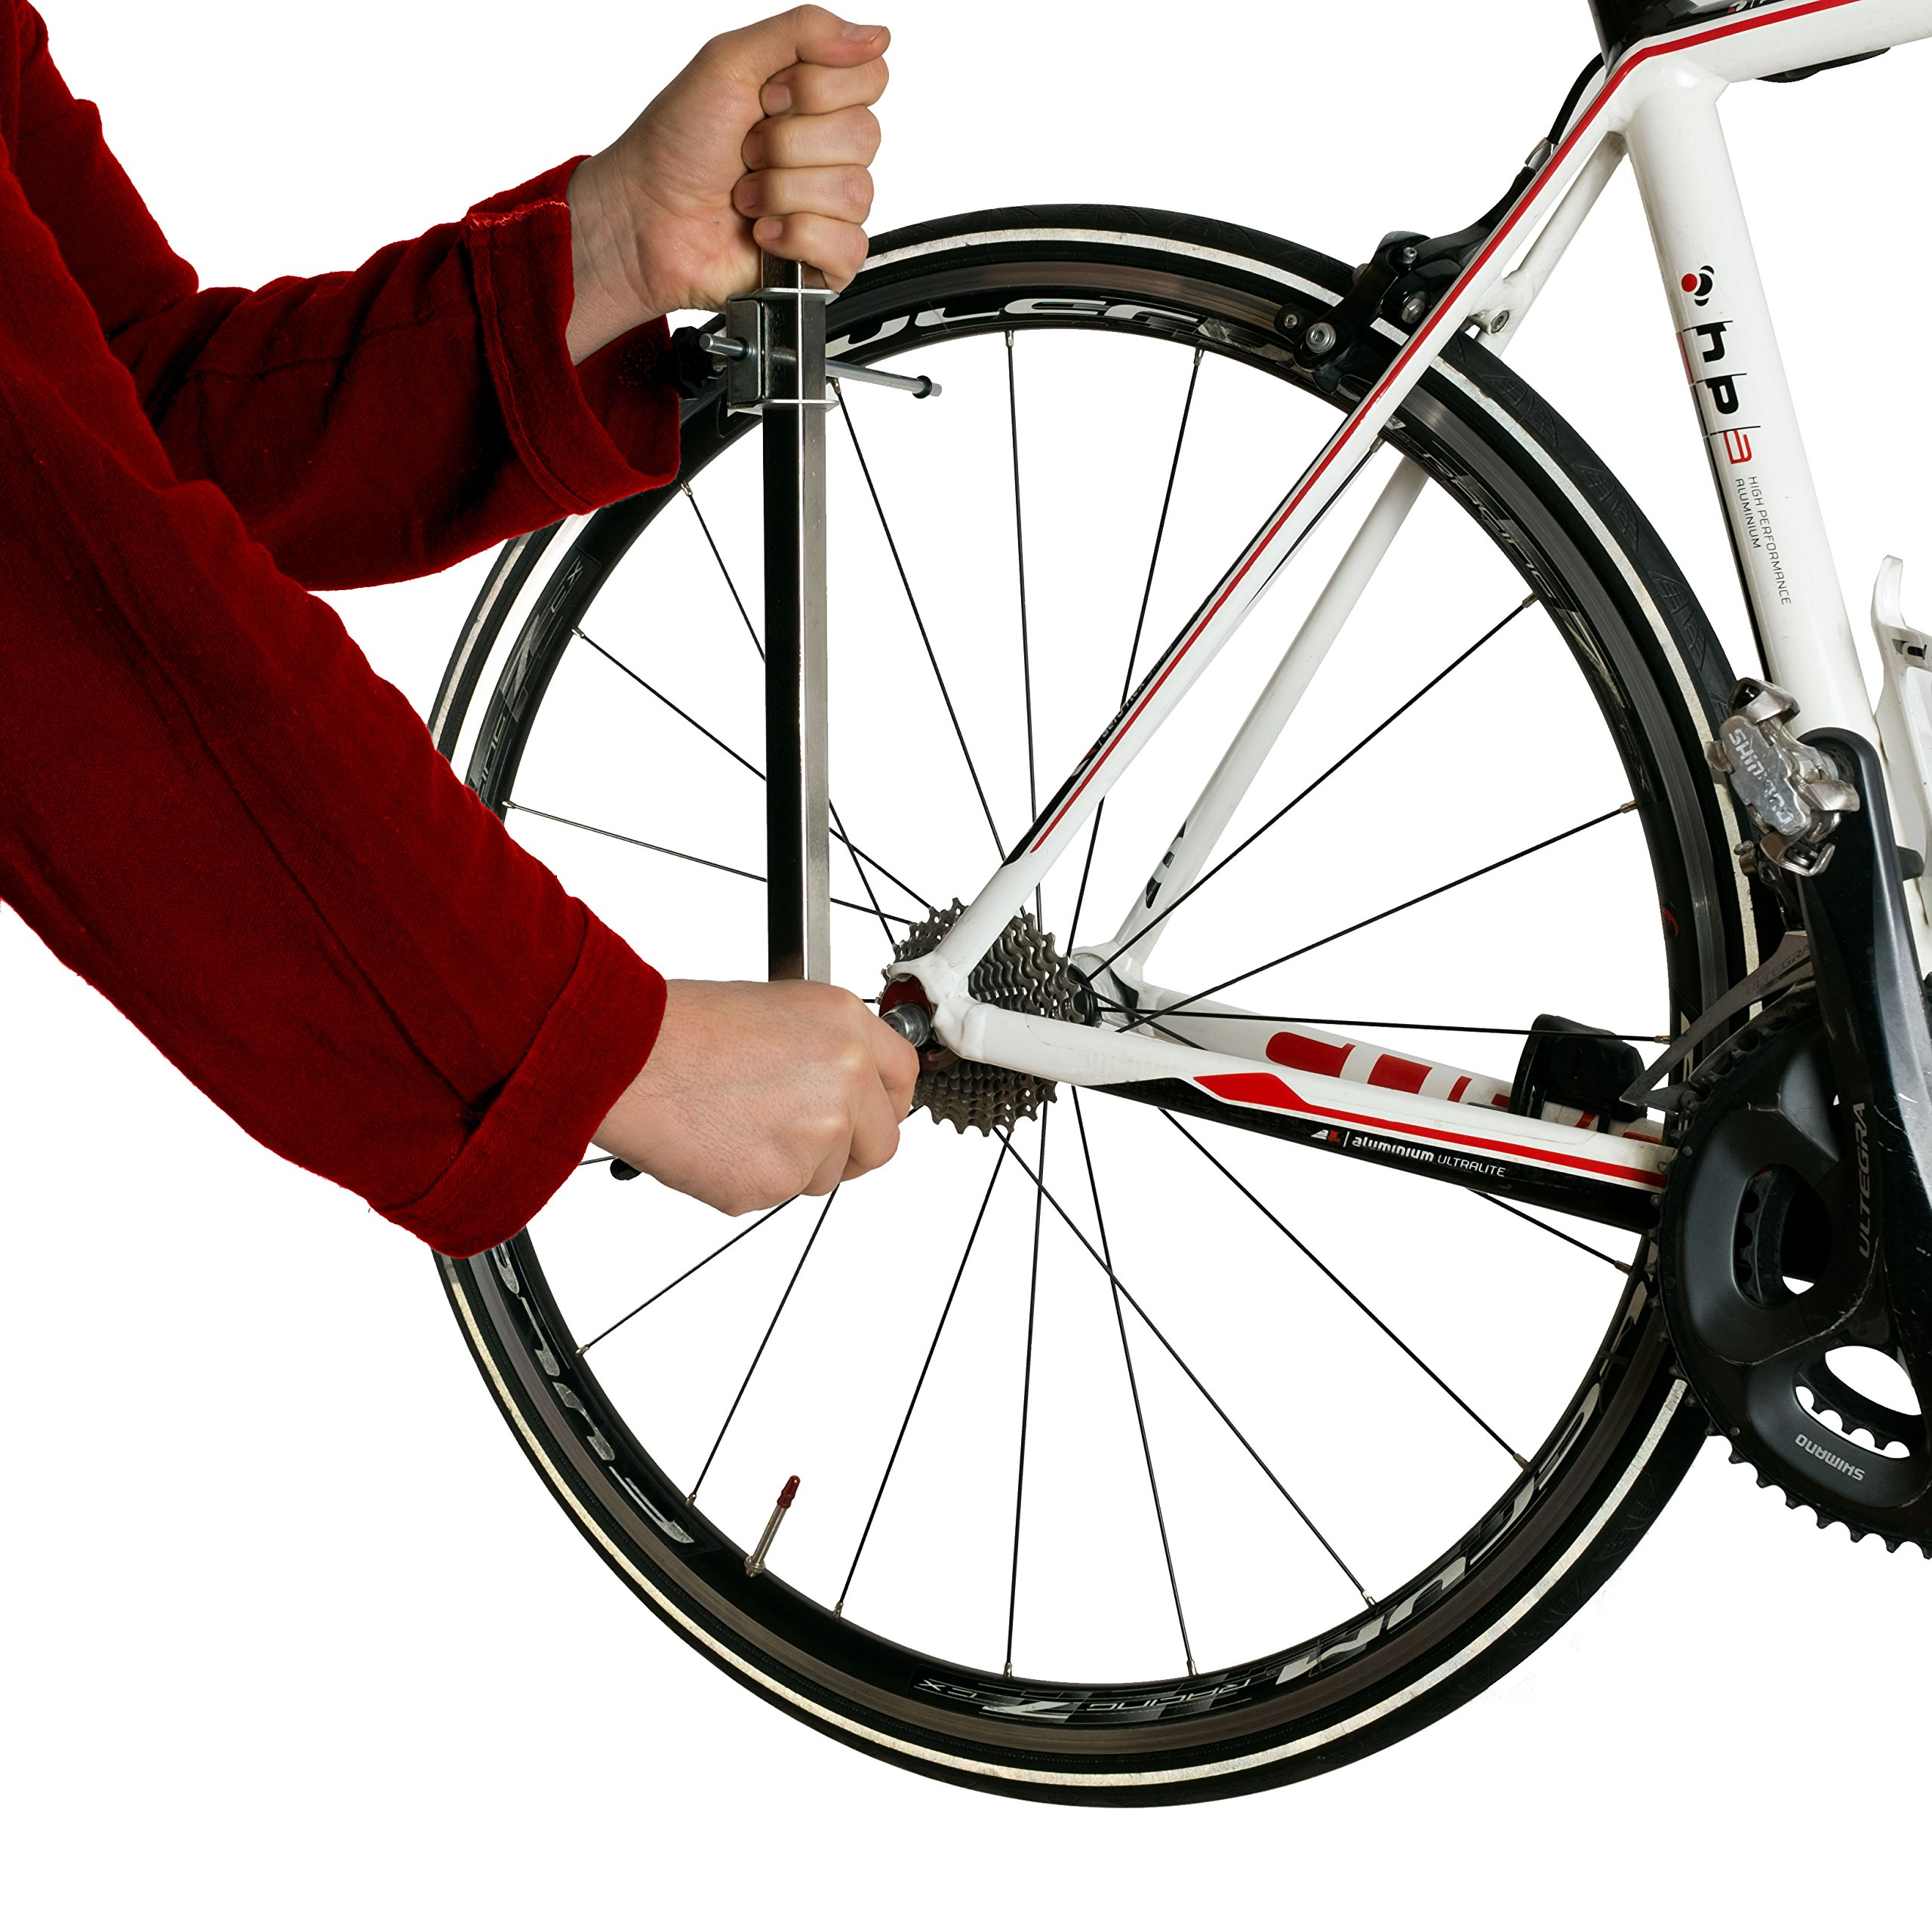 CycloSpirit Derailleur Hanger Alignment Gauge by CycloSpirit (Image #5)